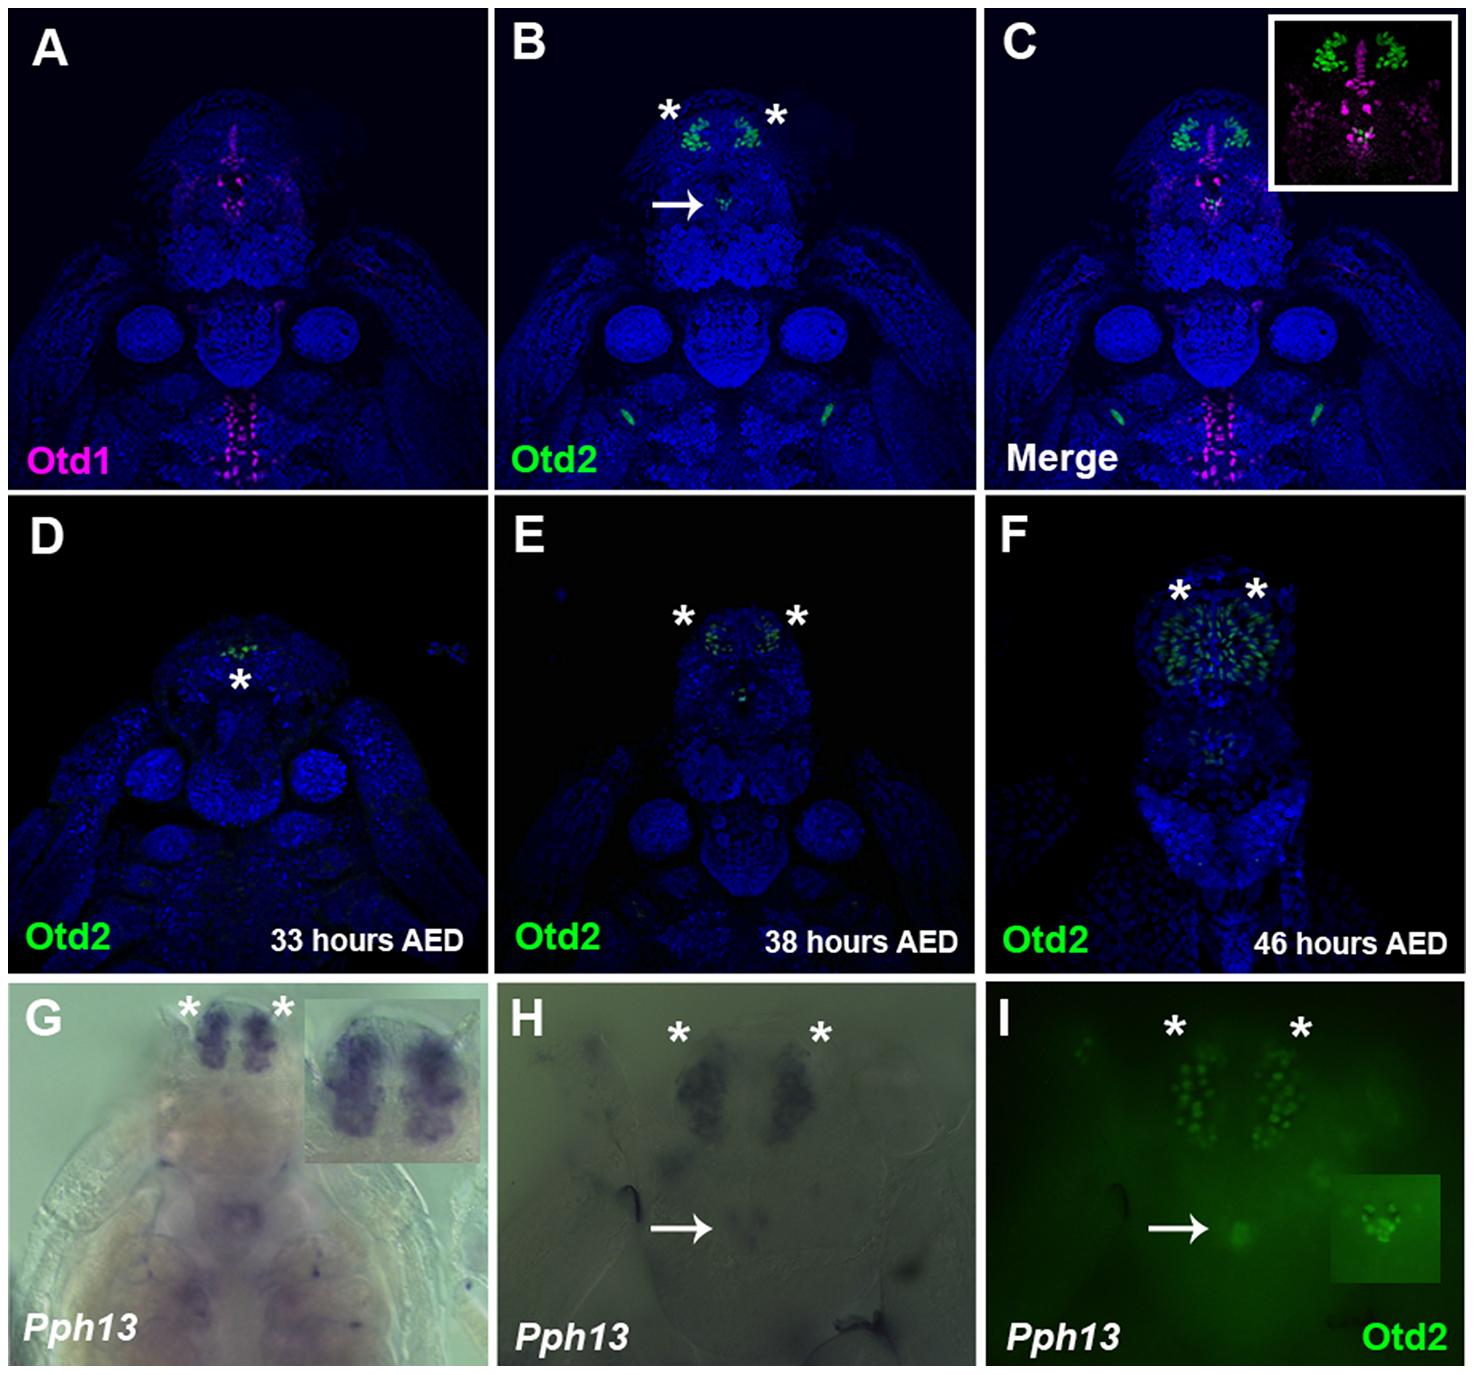 Spatial expression patterns of <i>Daphnia magna</i> Otd1, Otd2 and <i>Pph13</i> during <i>Daphnia</i> eye development.